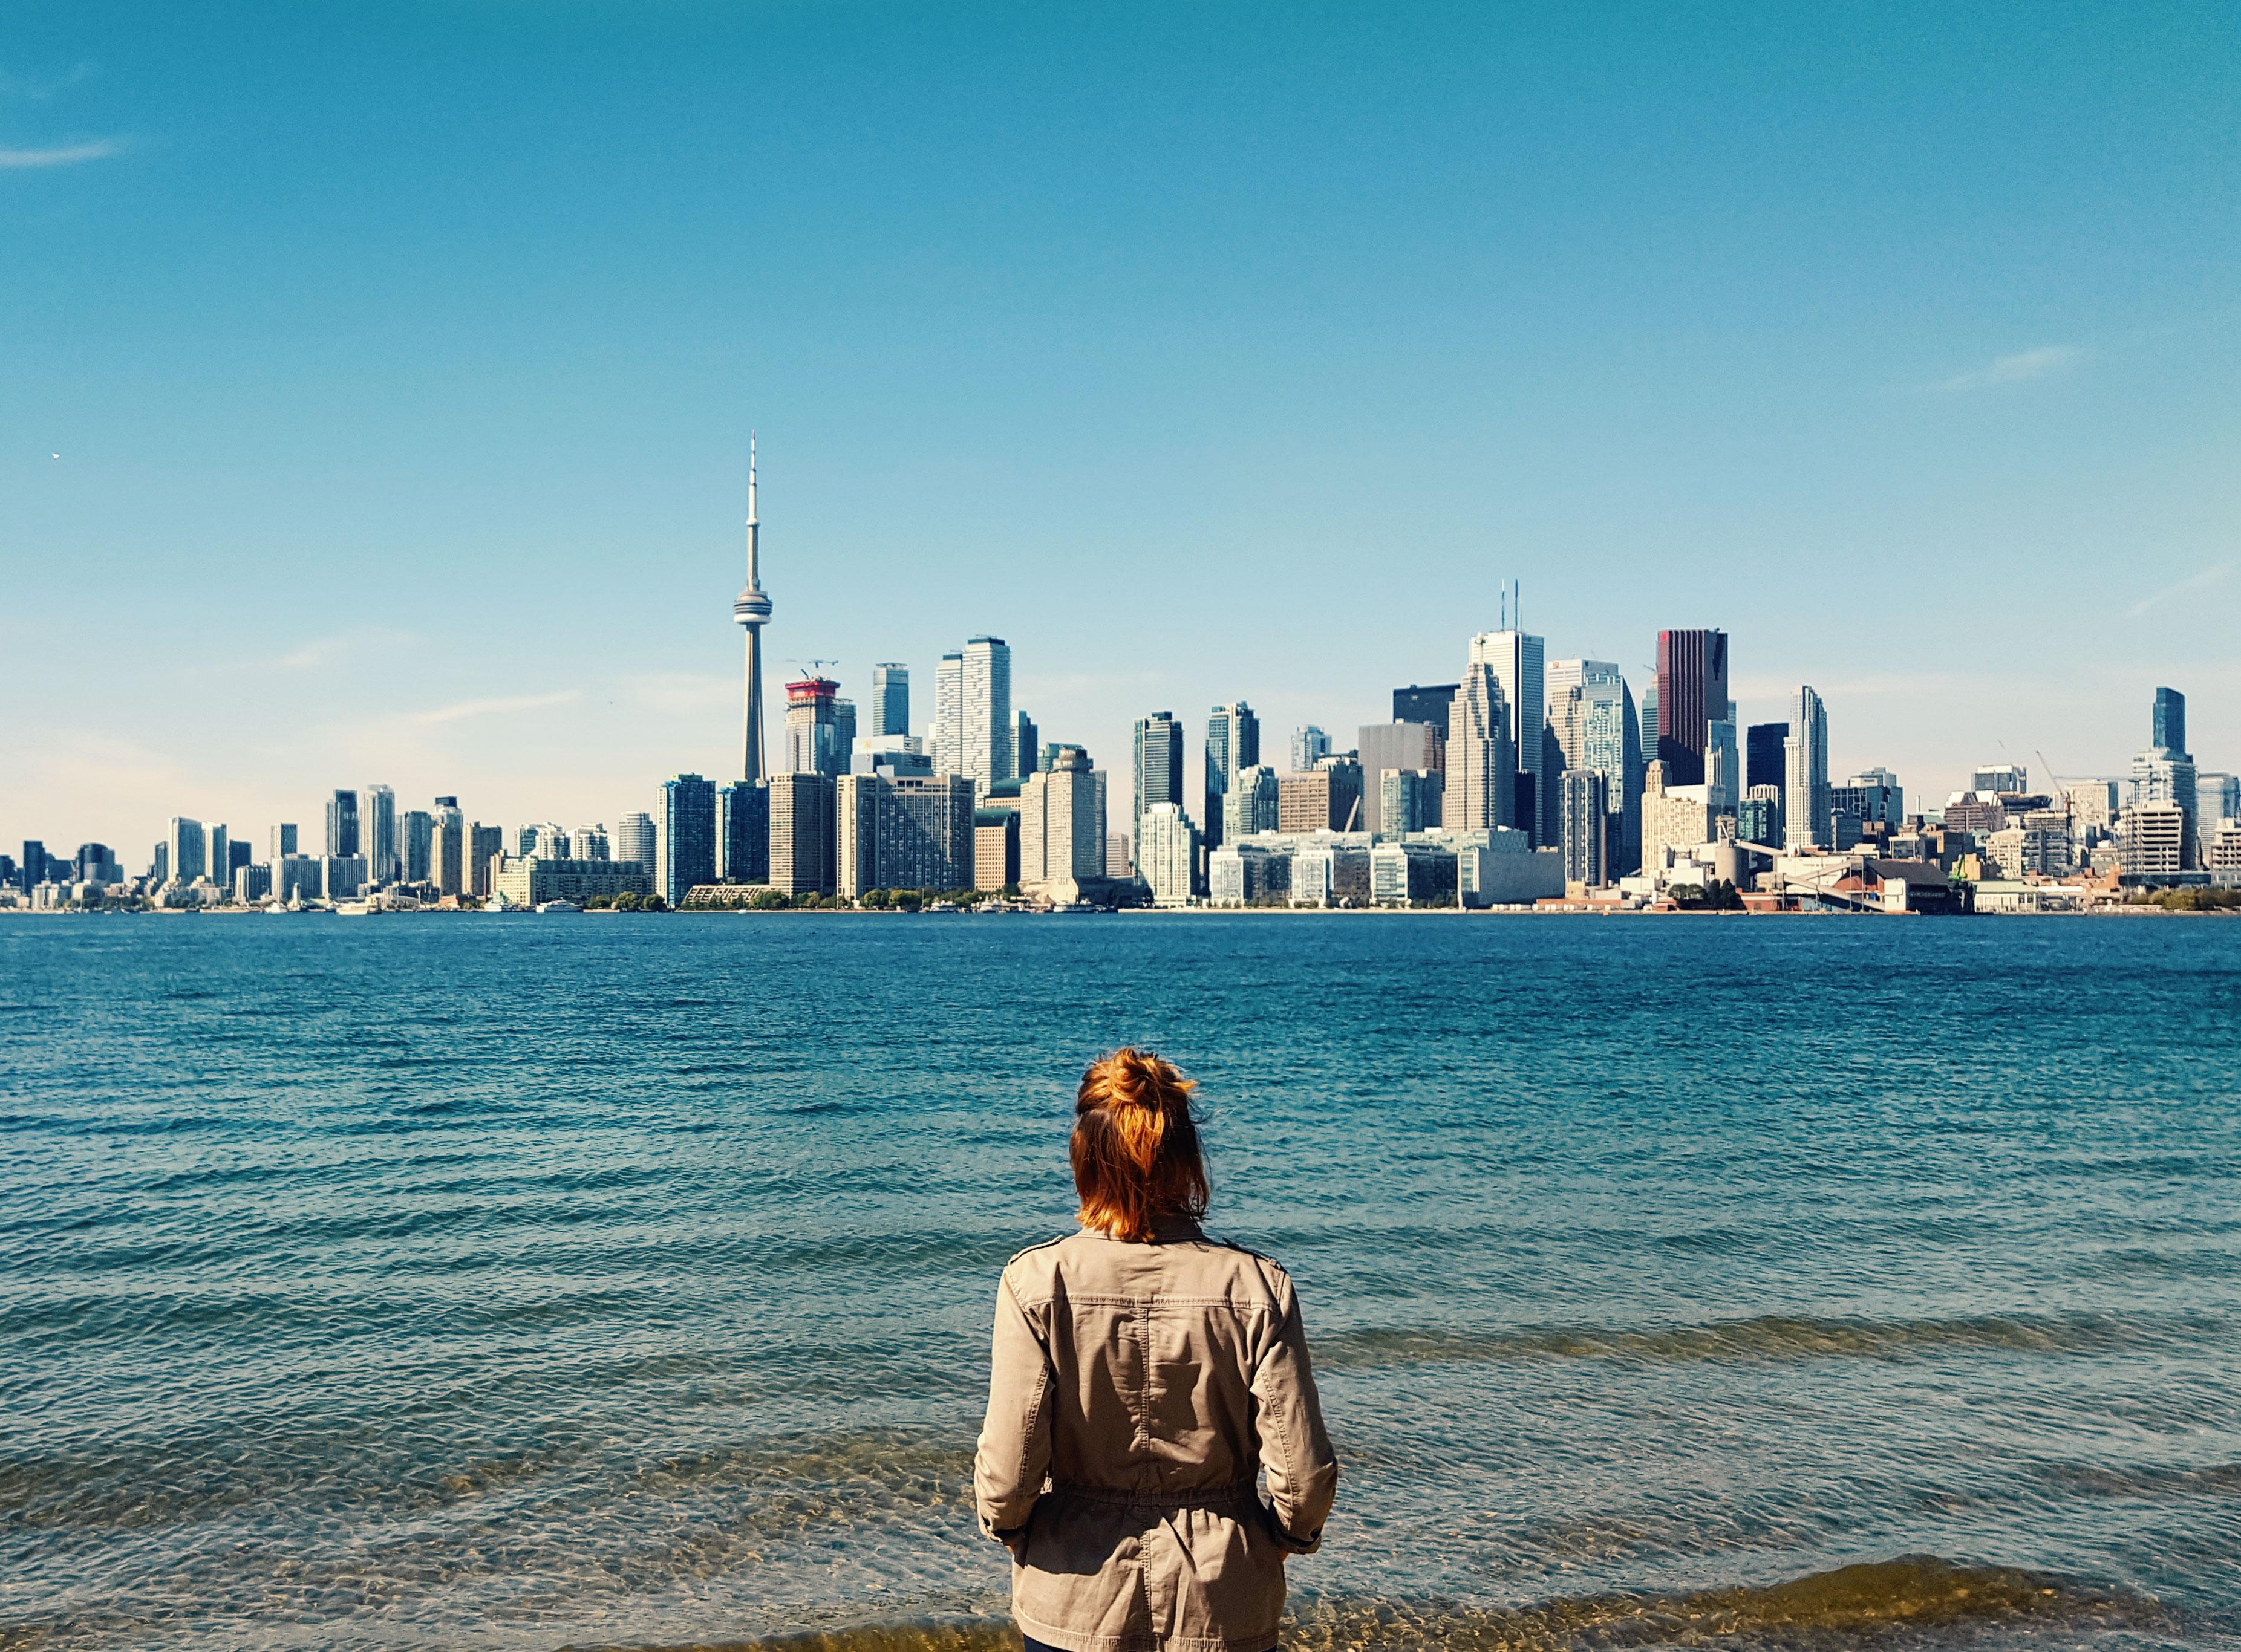 Coralie - Toronto Islands